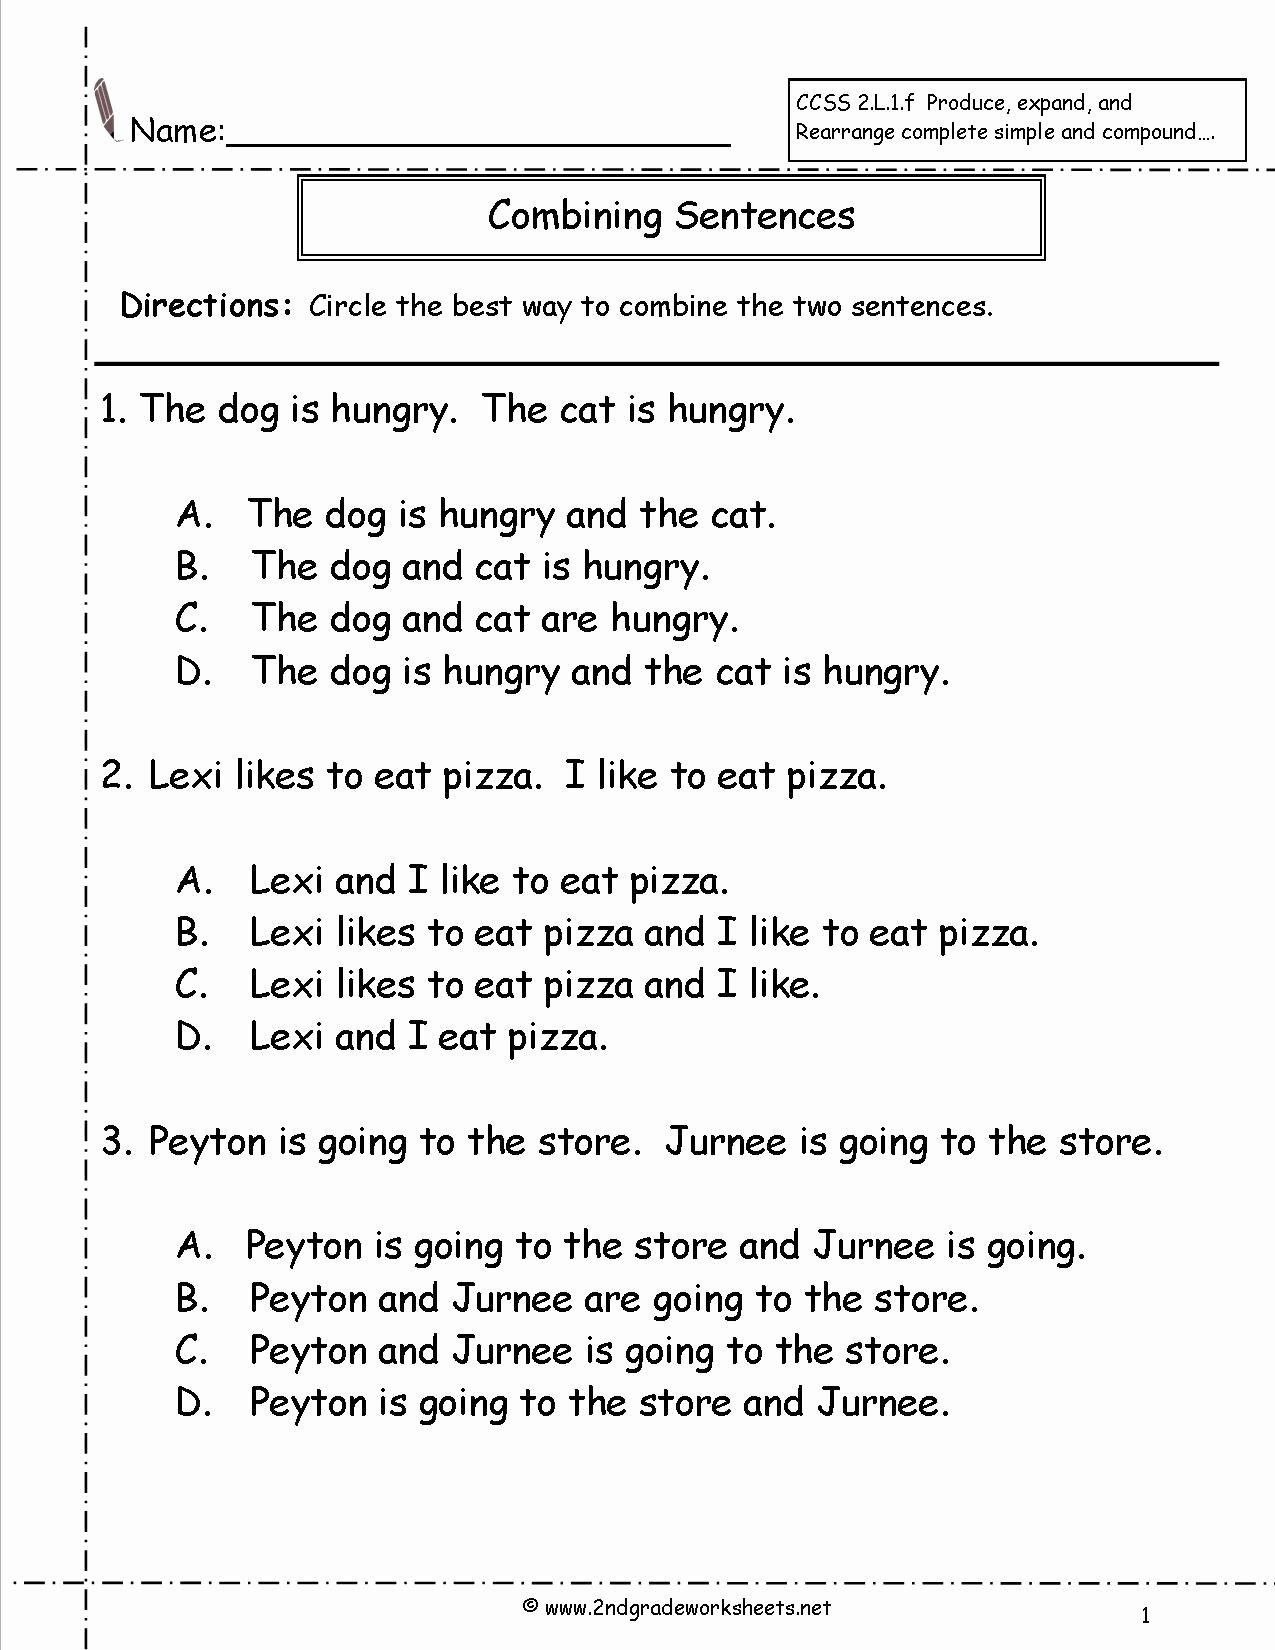 Complex Sentence Worksheets 3rd Grade Free Bining Sentences Worksheet